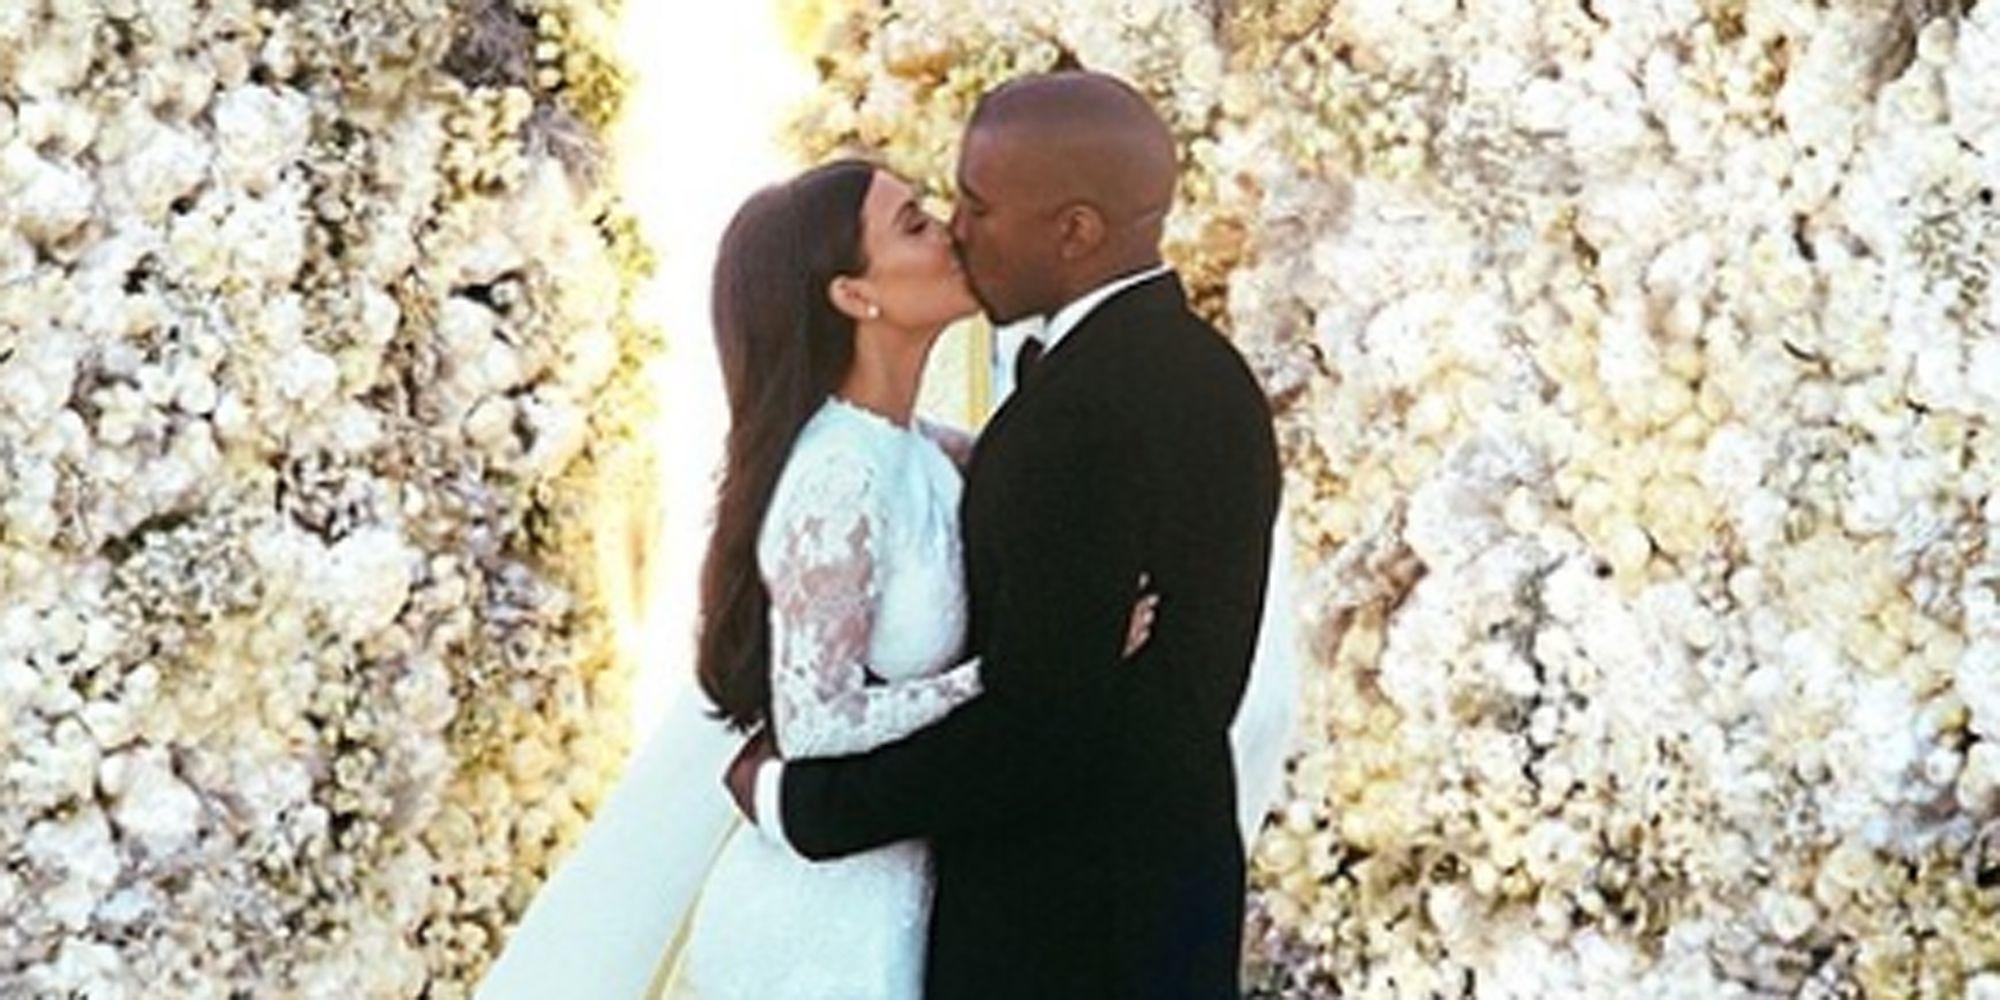 Kim Kardashian Shares Wedding Dress Fitting Photos For Third Anniversary